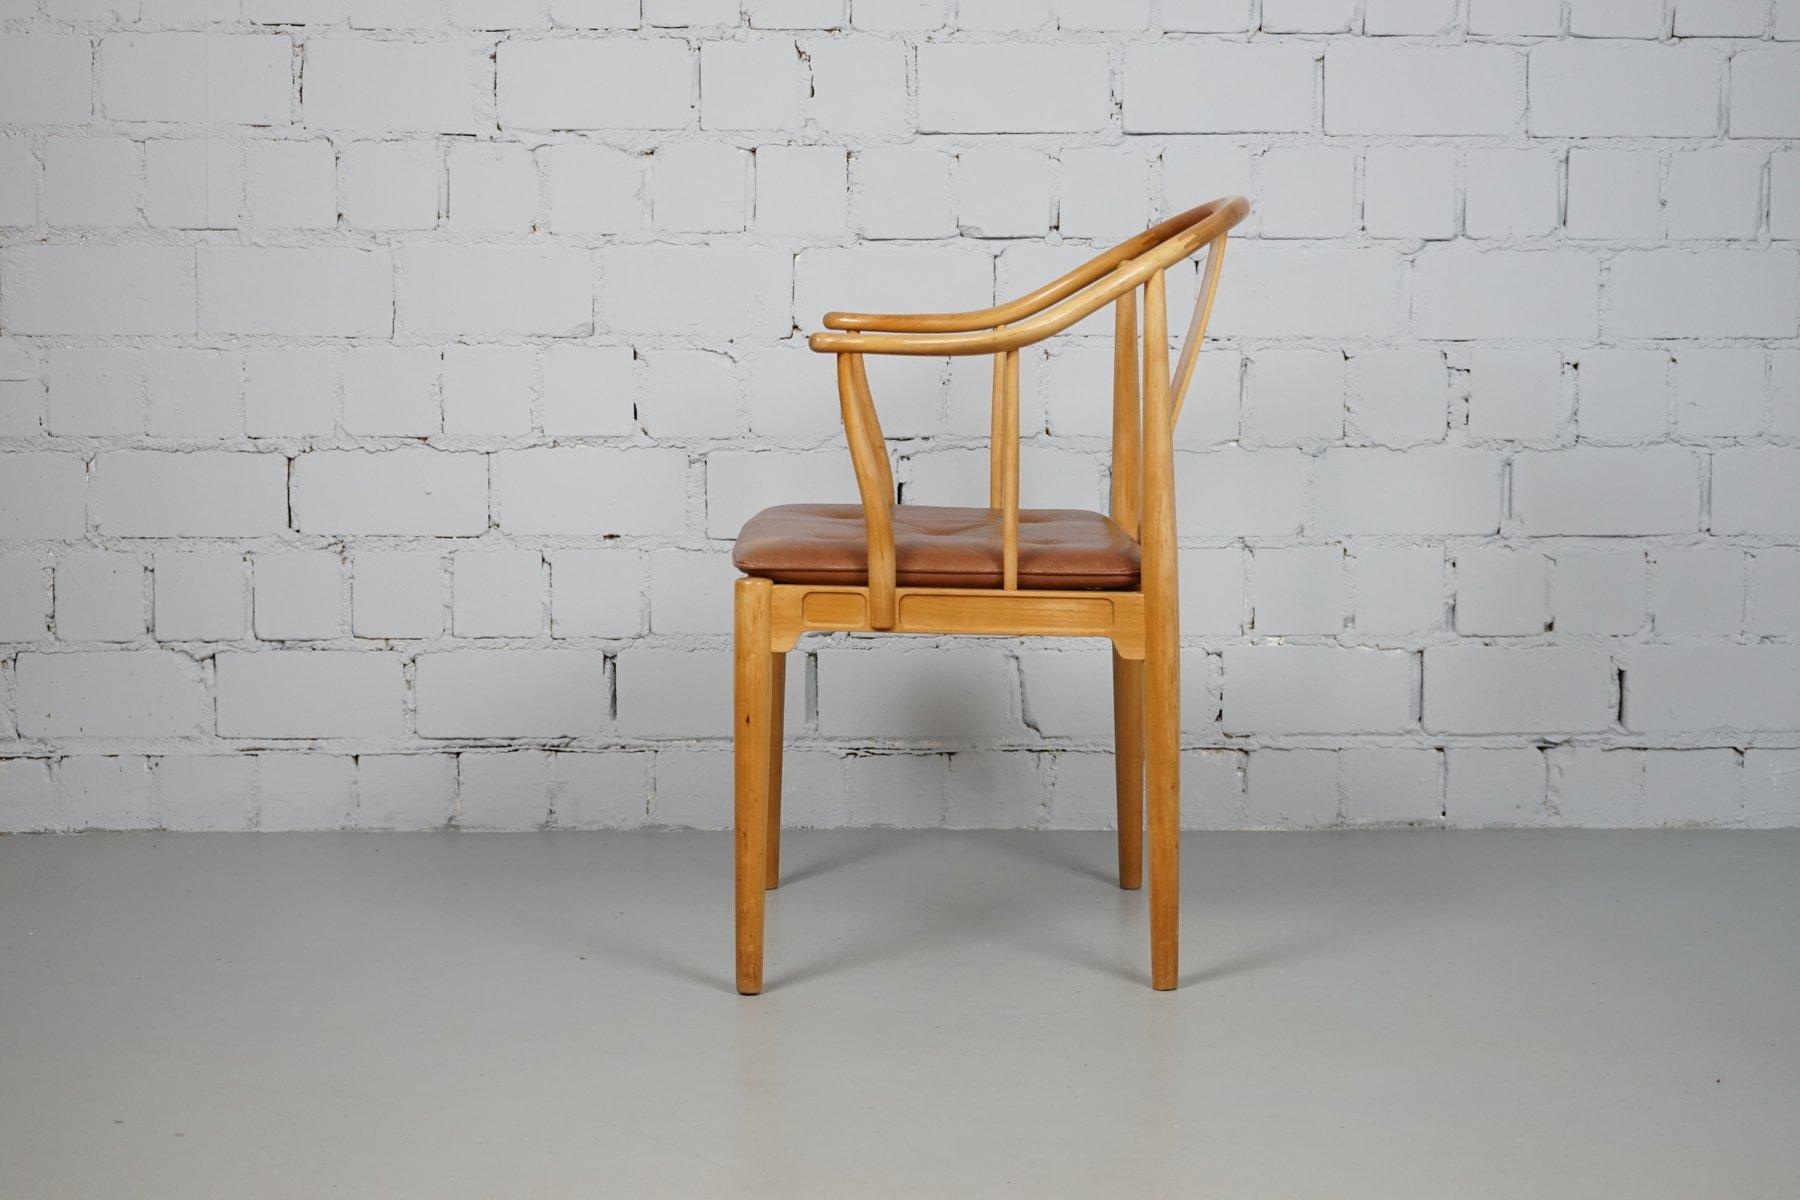 fh 4283 china stuhl von hans j wegner f r fritz hansen. Black Bedroom Furniture Sets. Home Design Ideas